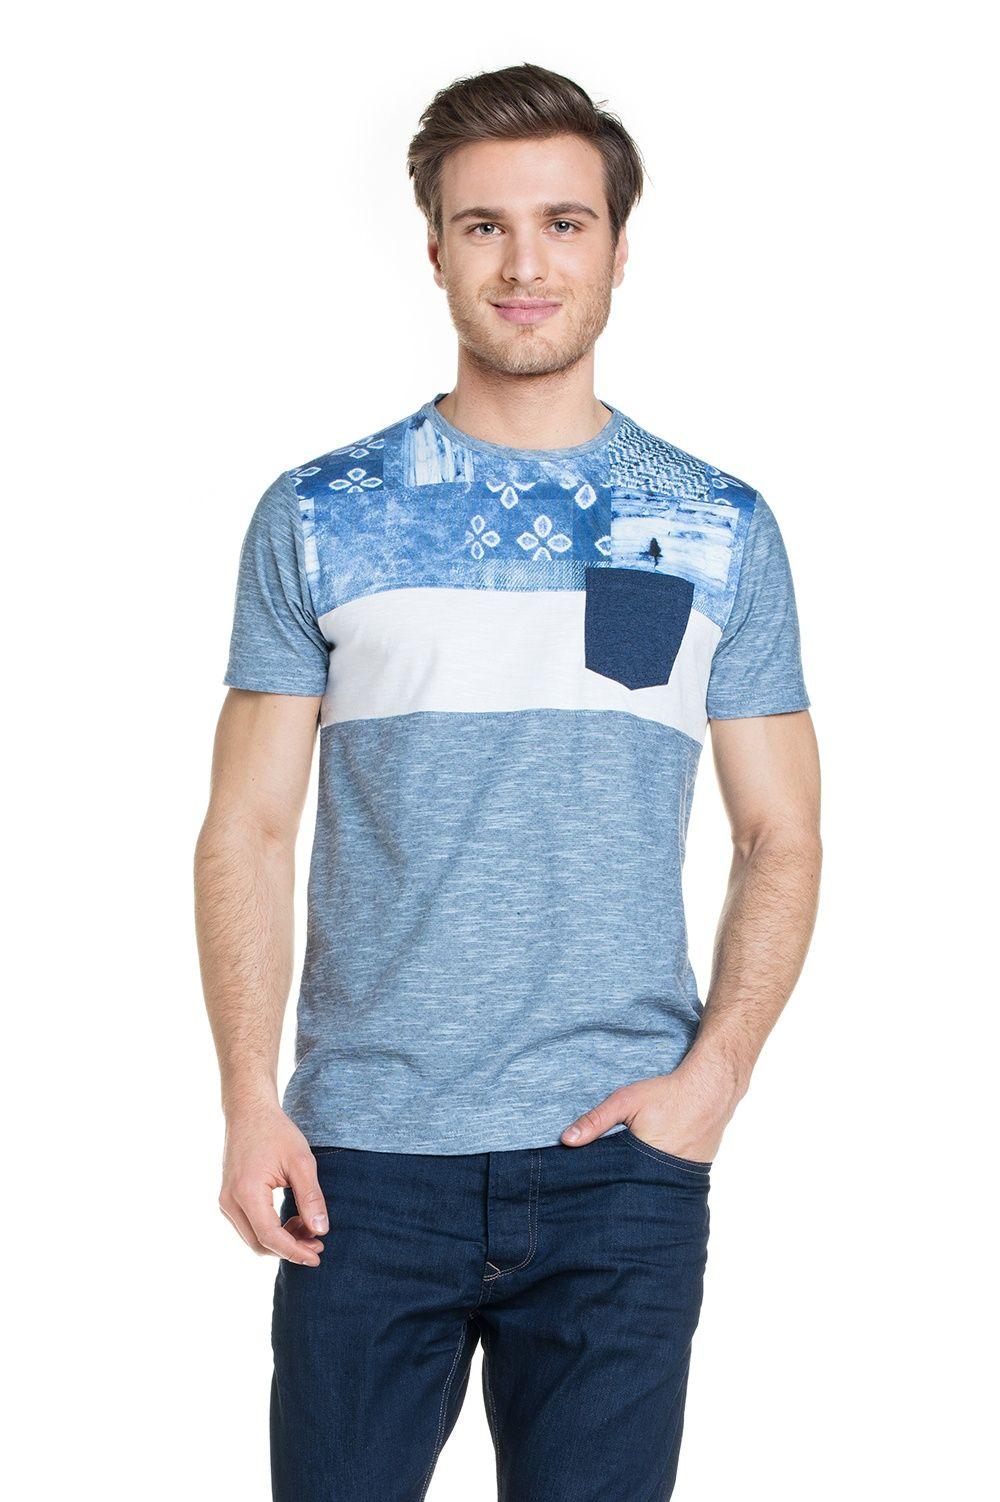 T-shirt de manga curta e bolso frontal | 114851 | Salsa